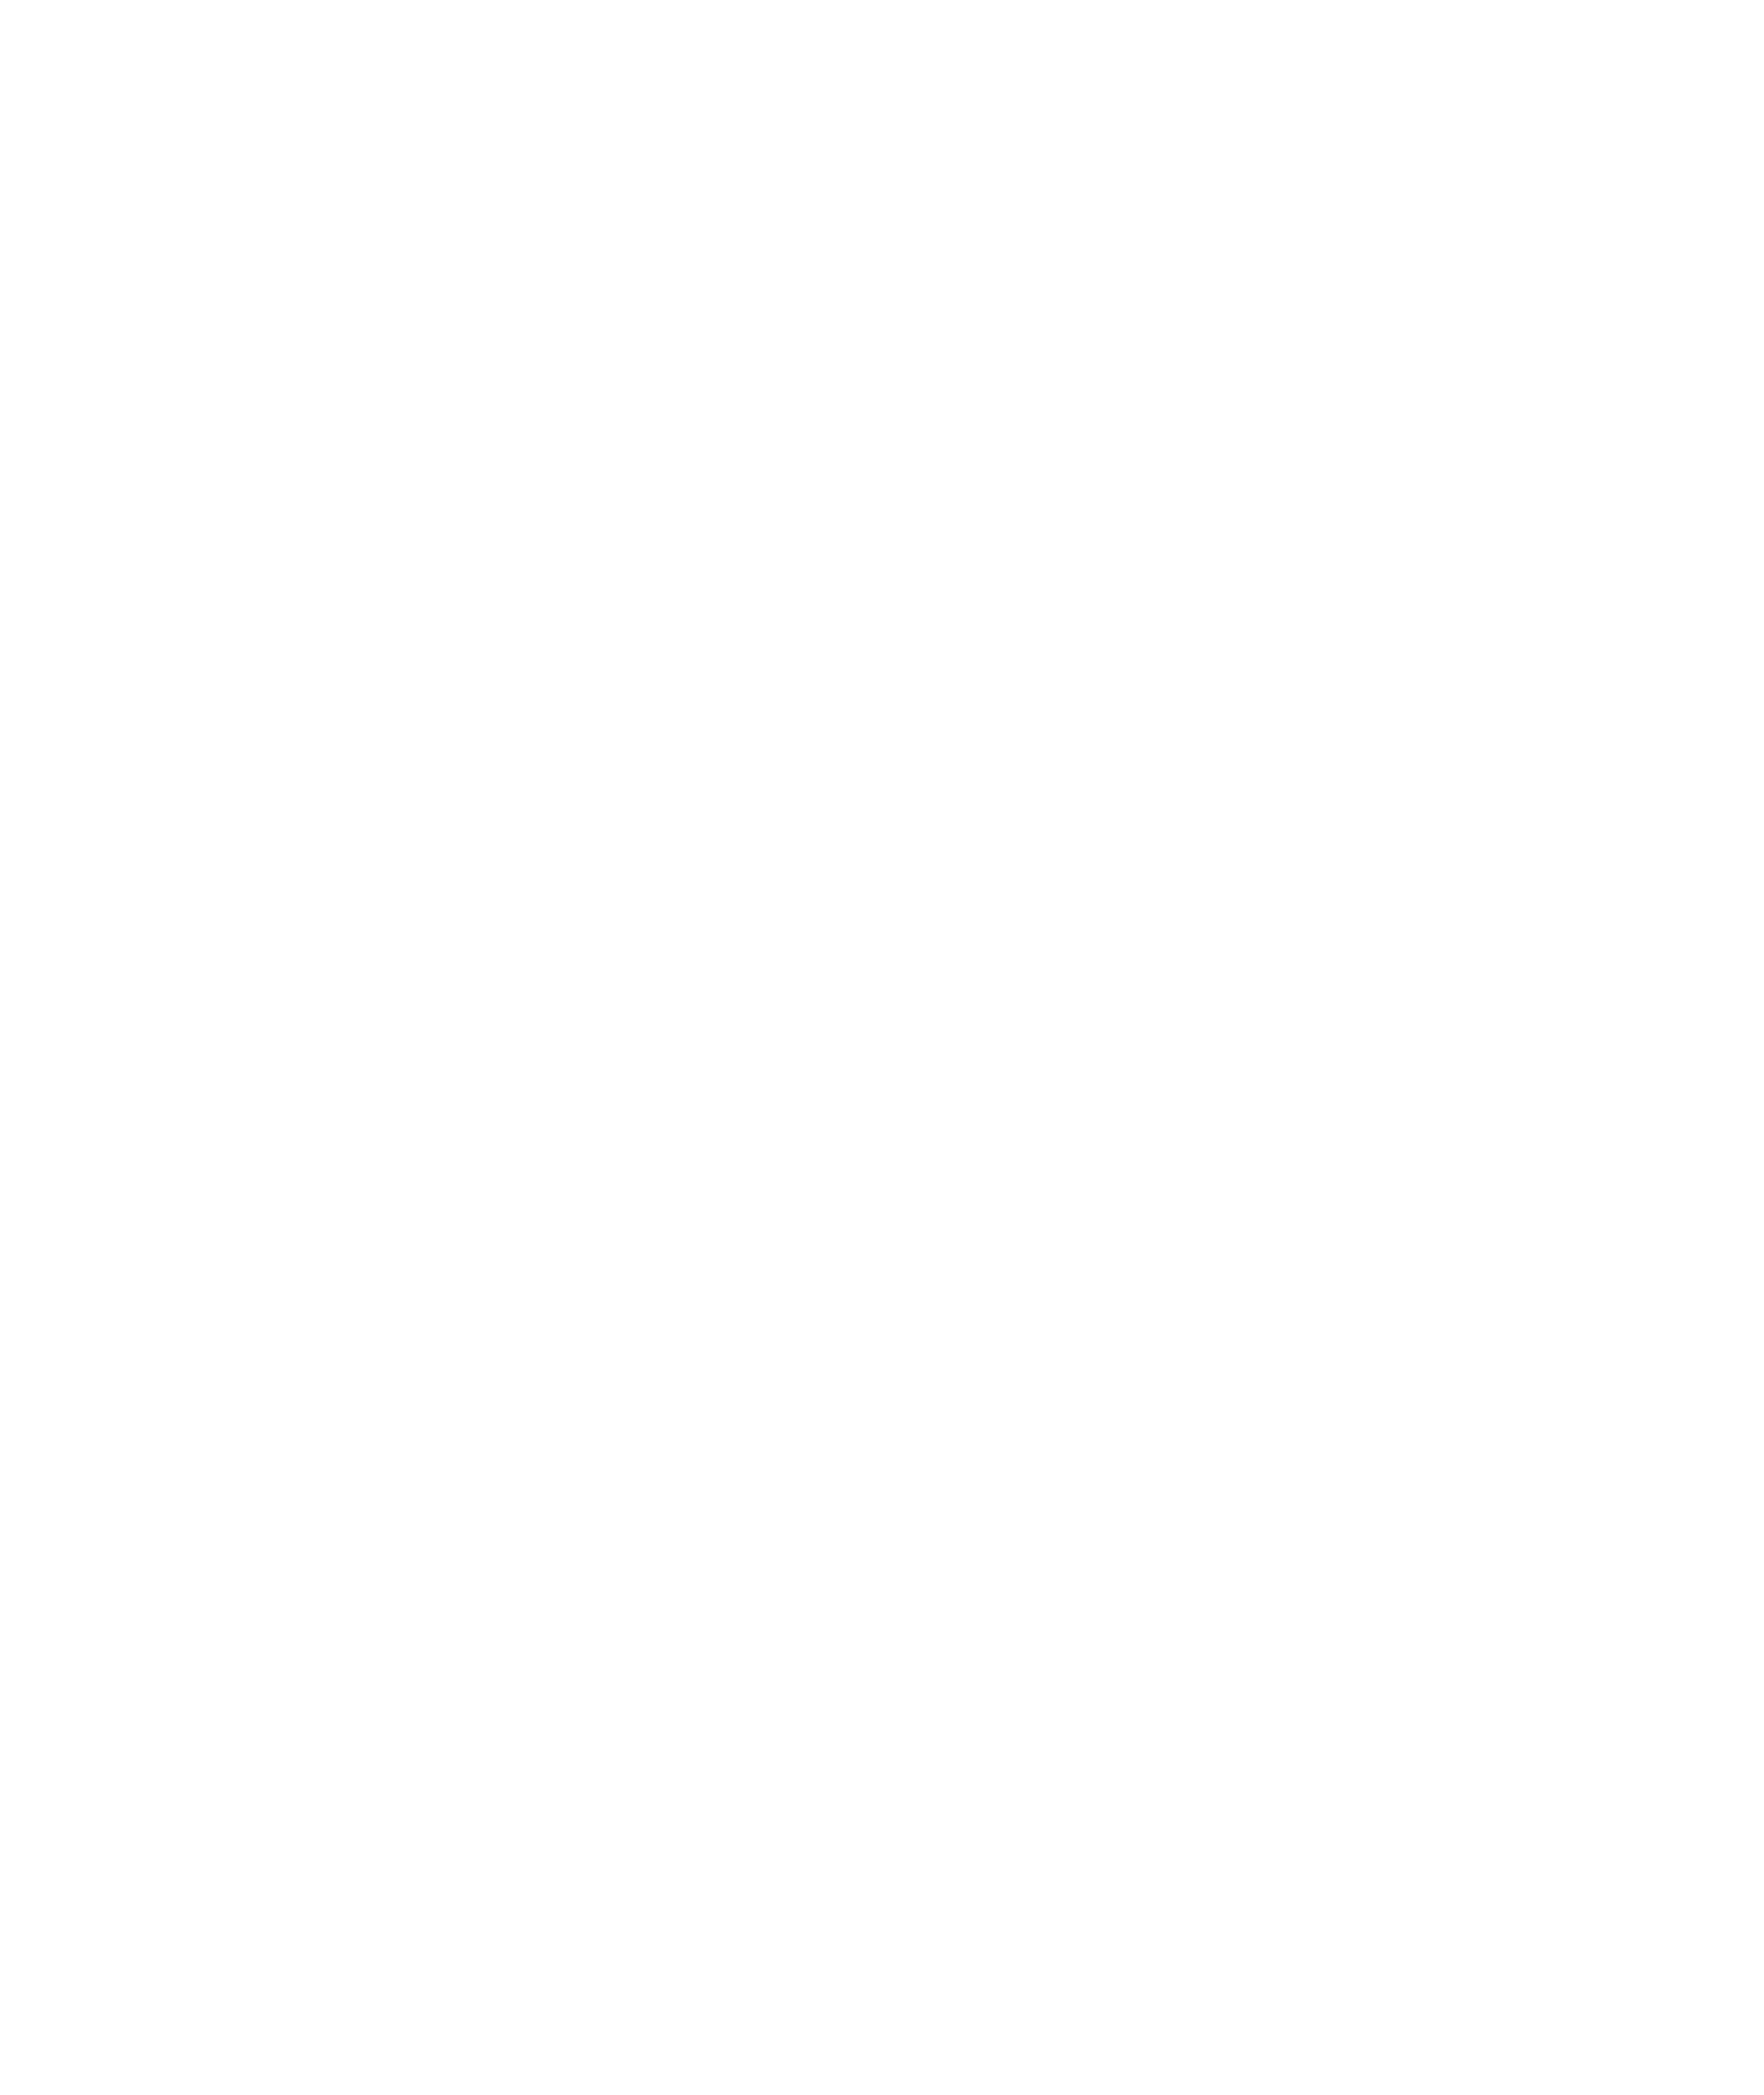 Launceston Church Grammar School Website